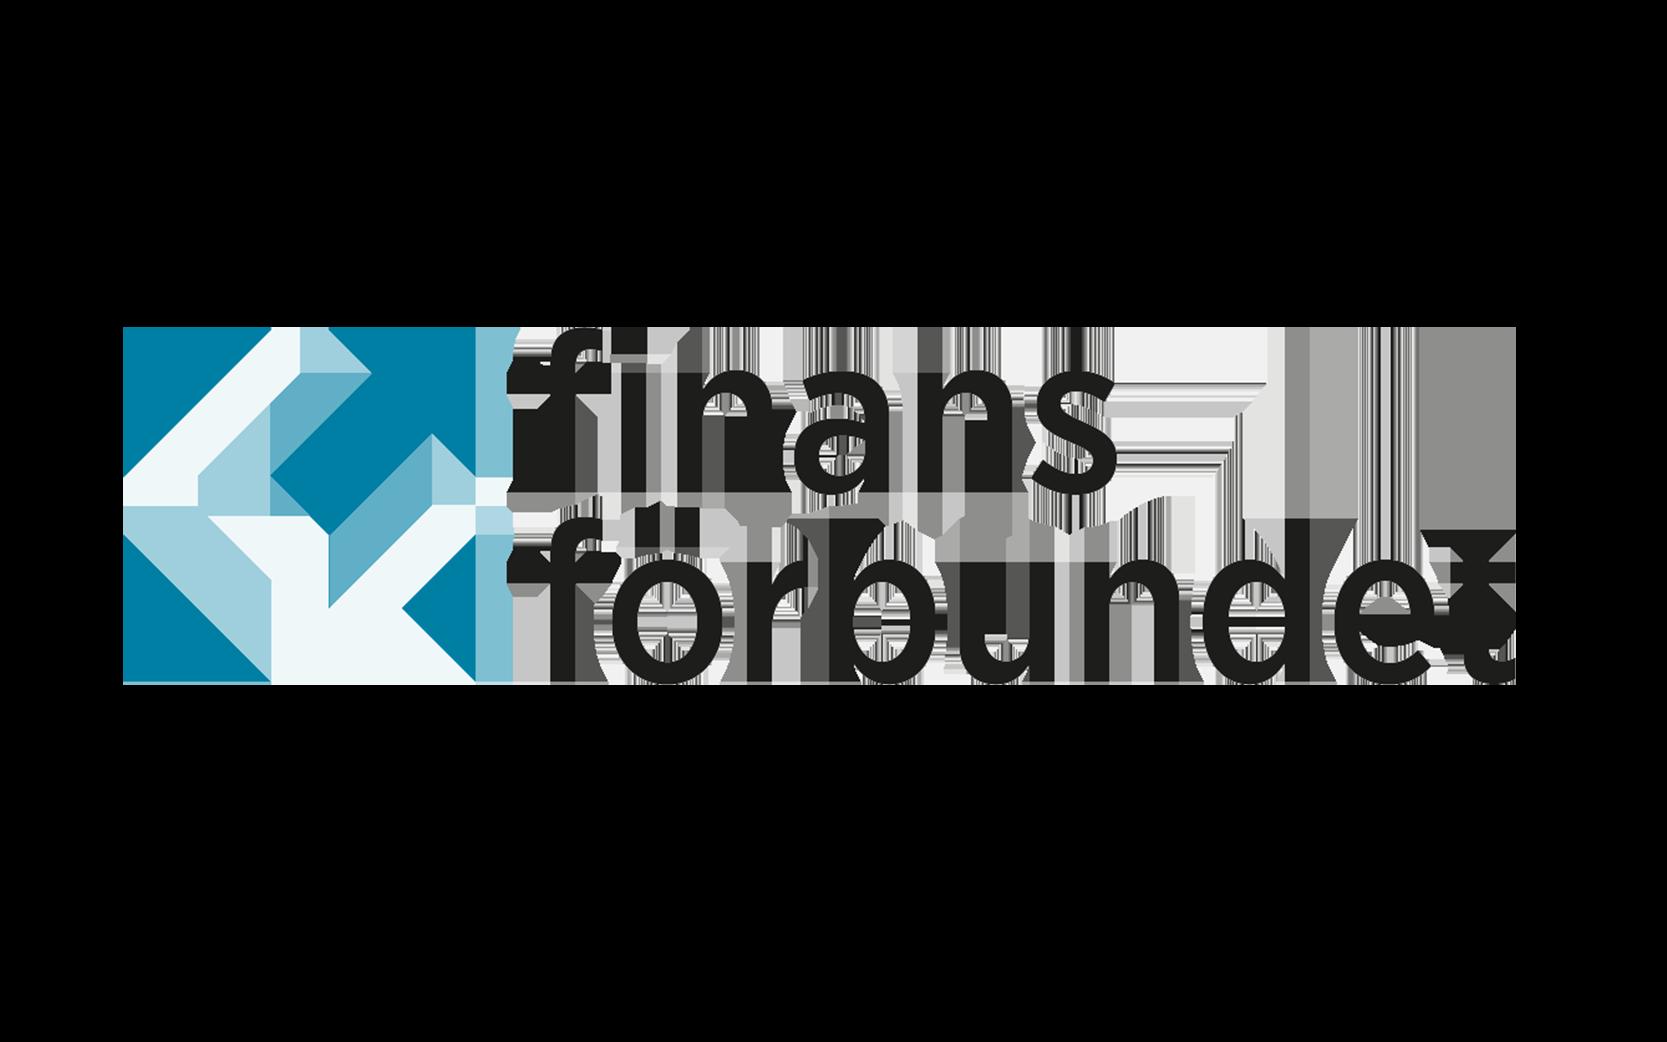 Finansförbundets logotyp